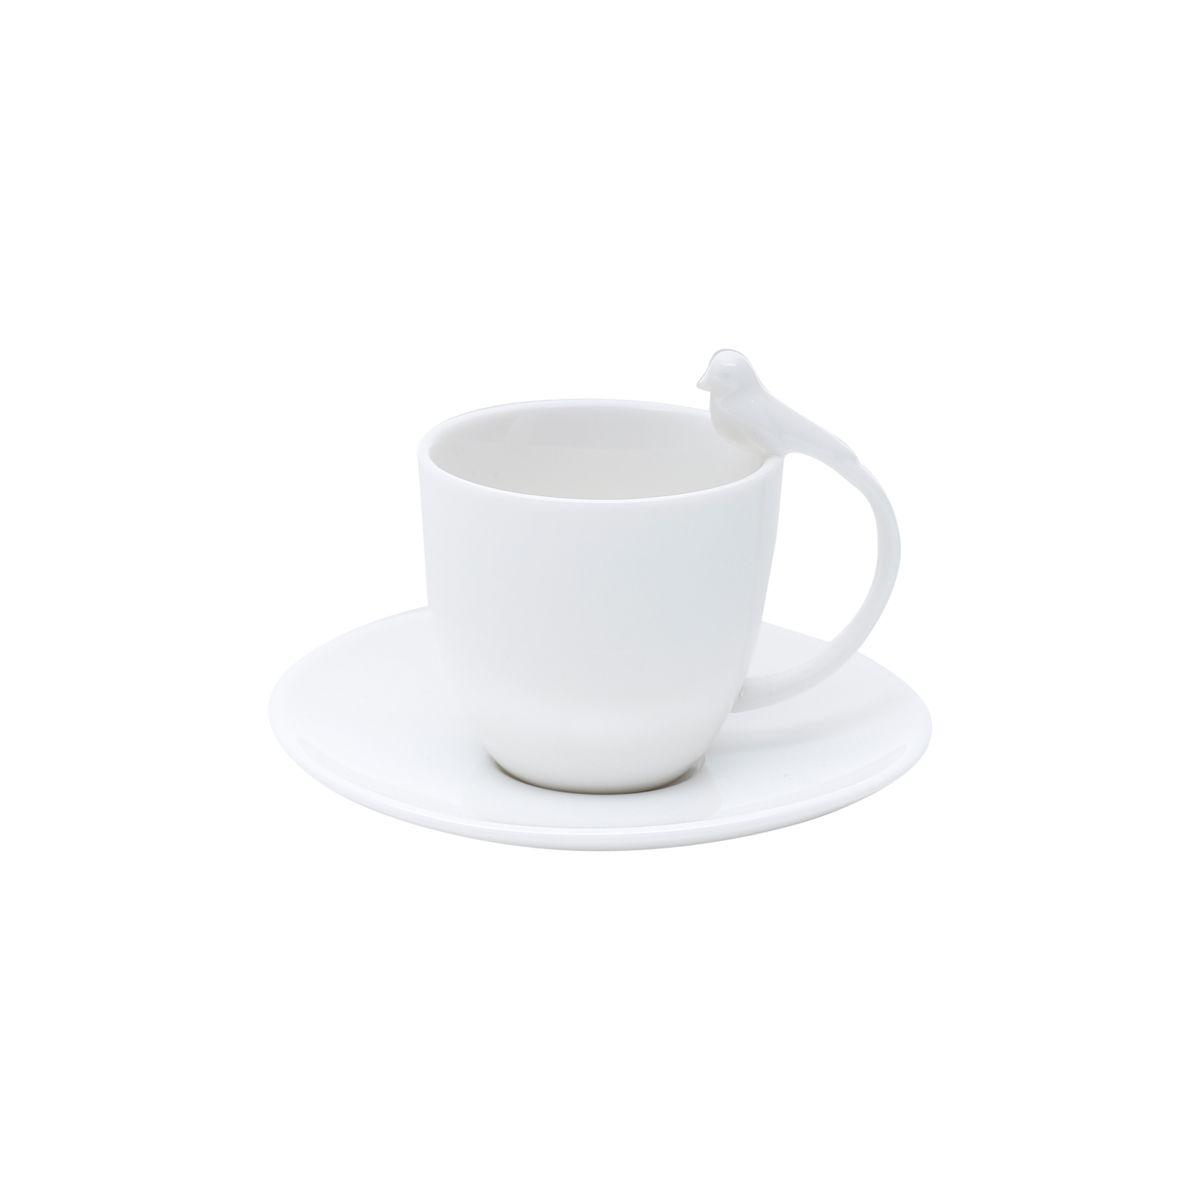 Jg 06 Xícaras de Café Bird de Porcelana Branca Wolff 85ml